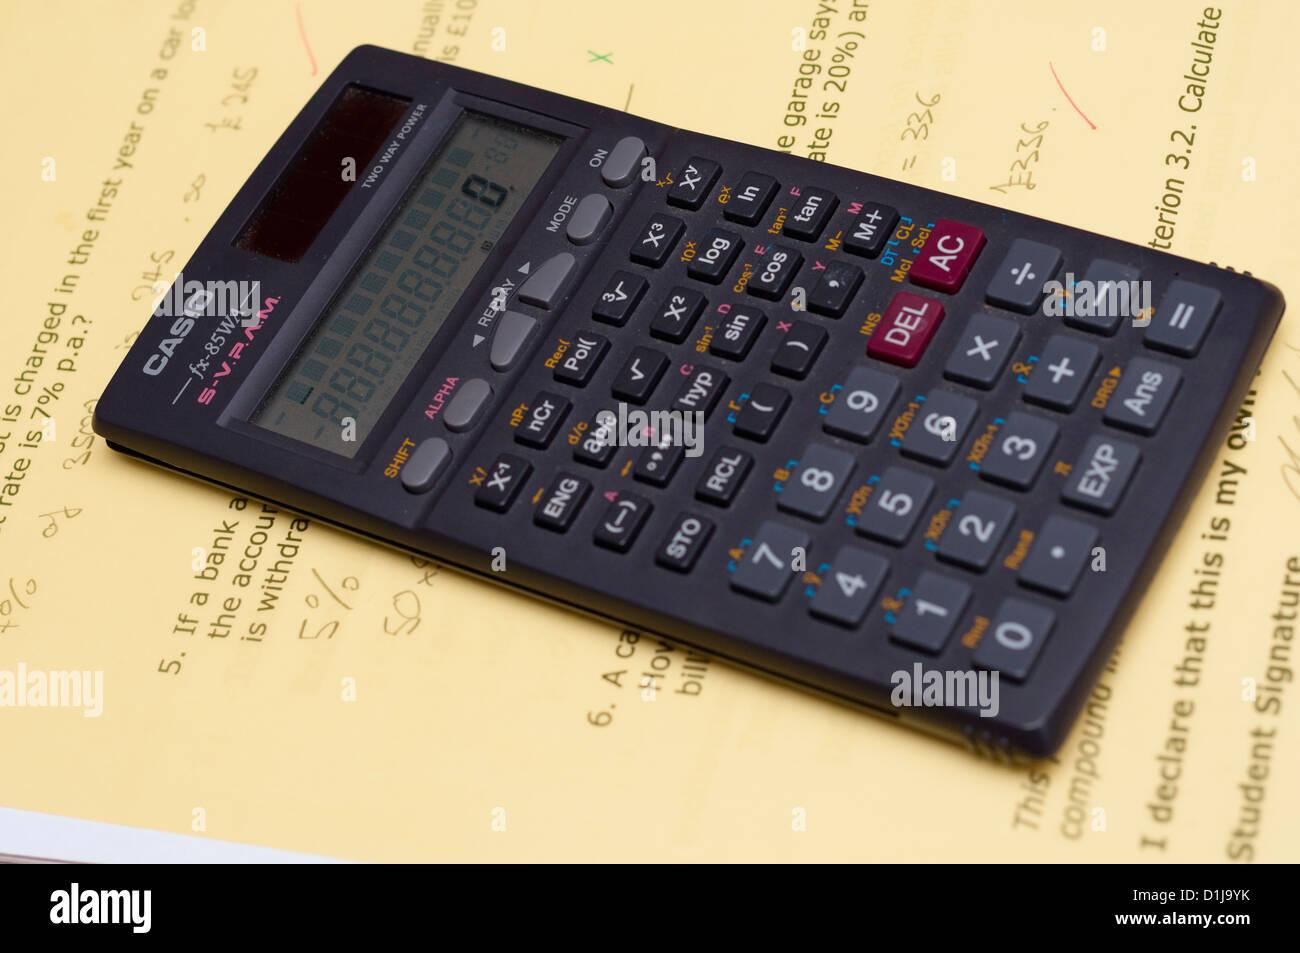 Scientific calculator on student school work. - Stock Image